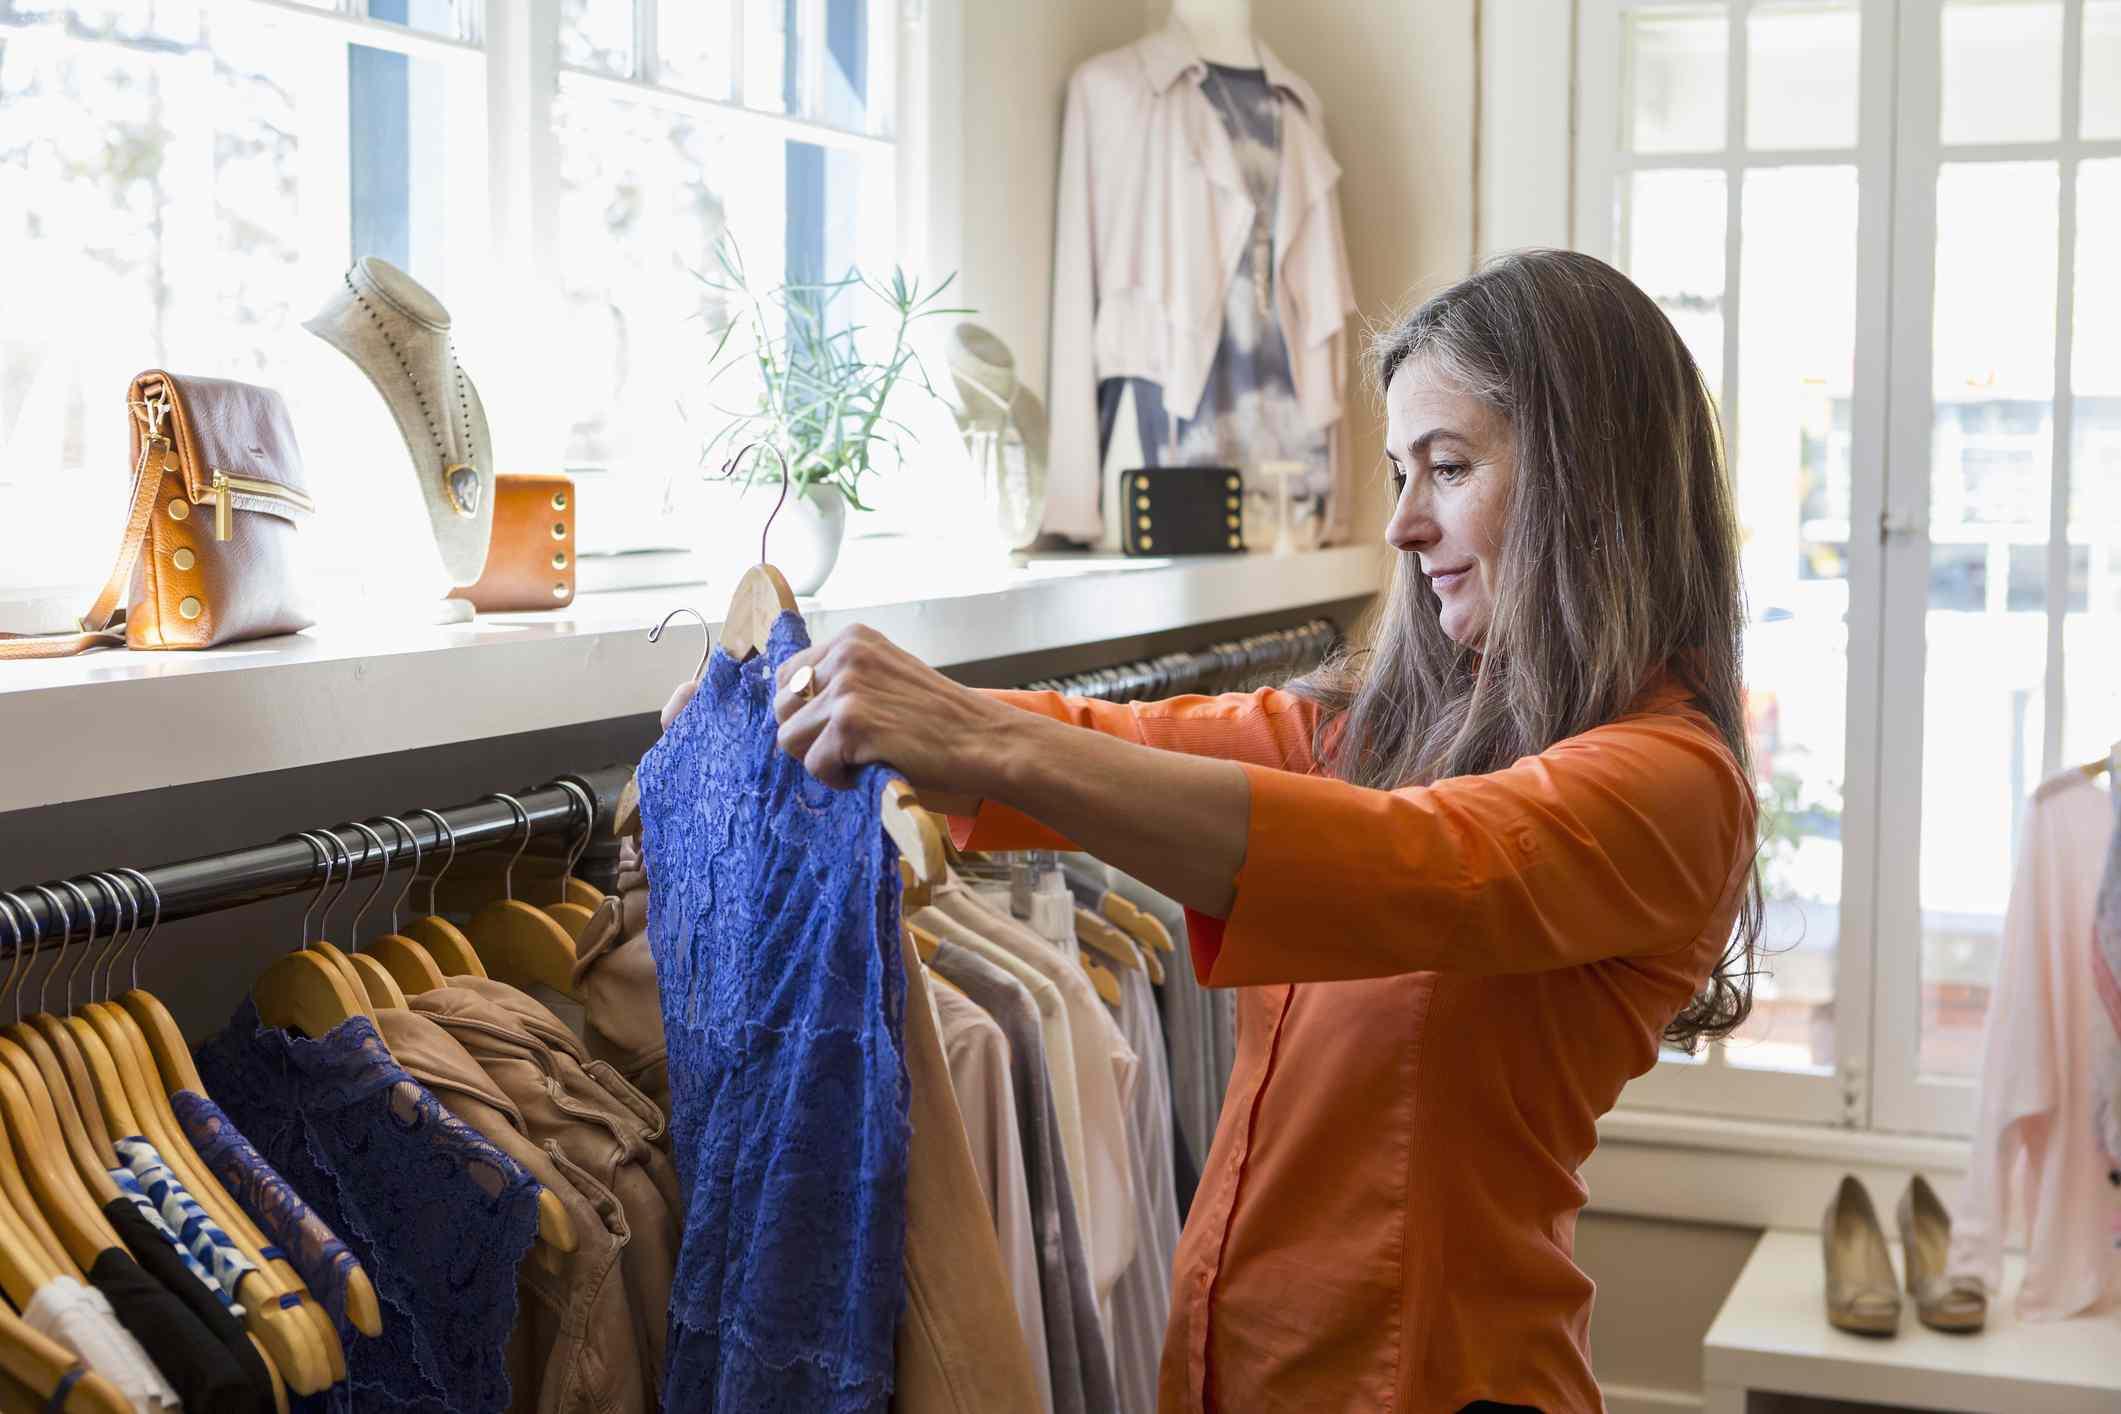 Caucasian woman shopping in clothing store